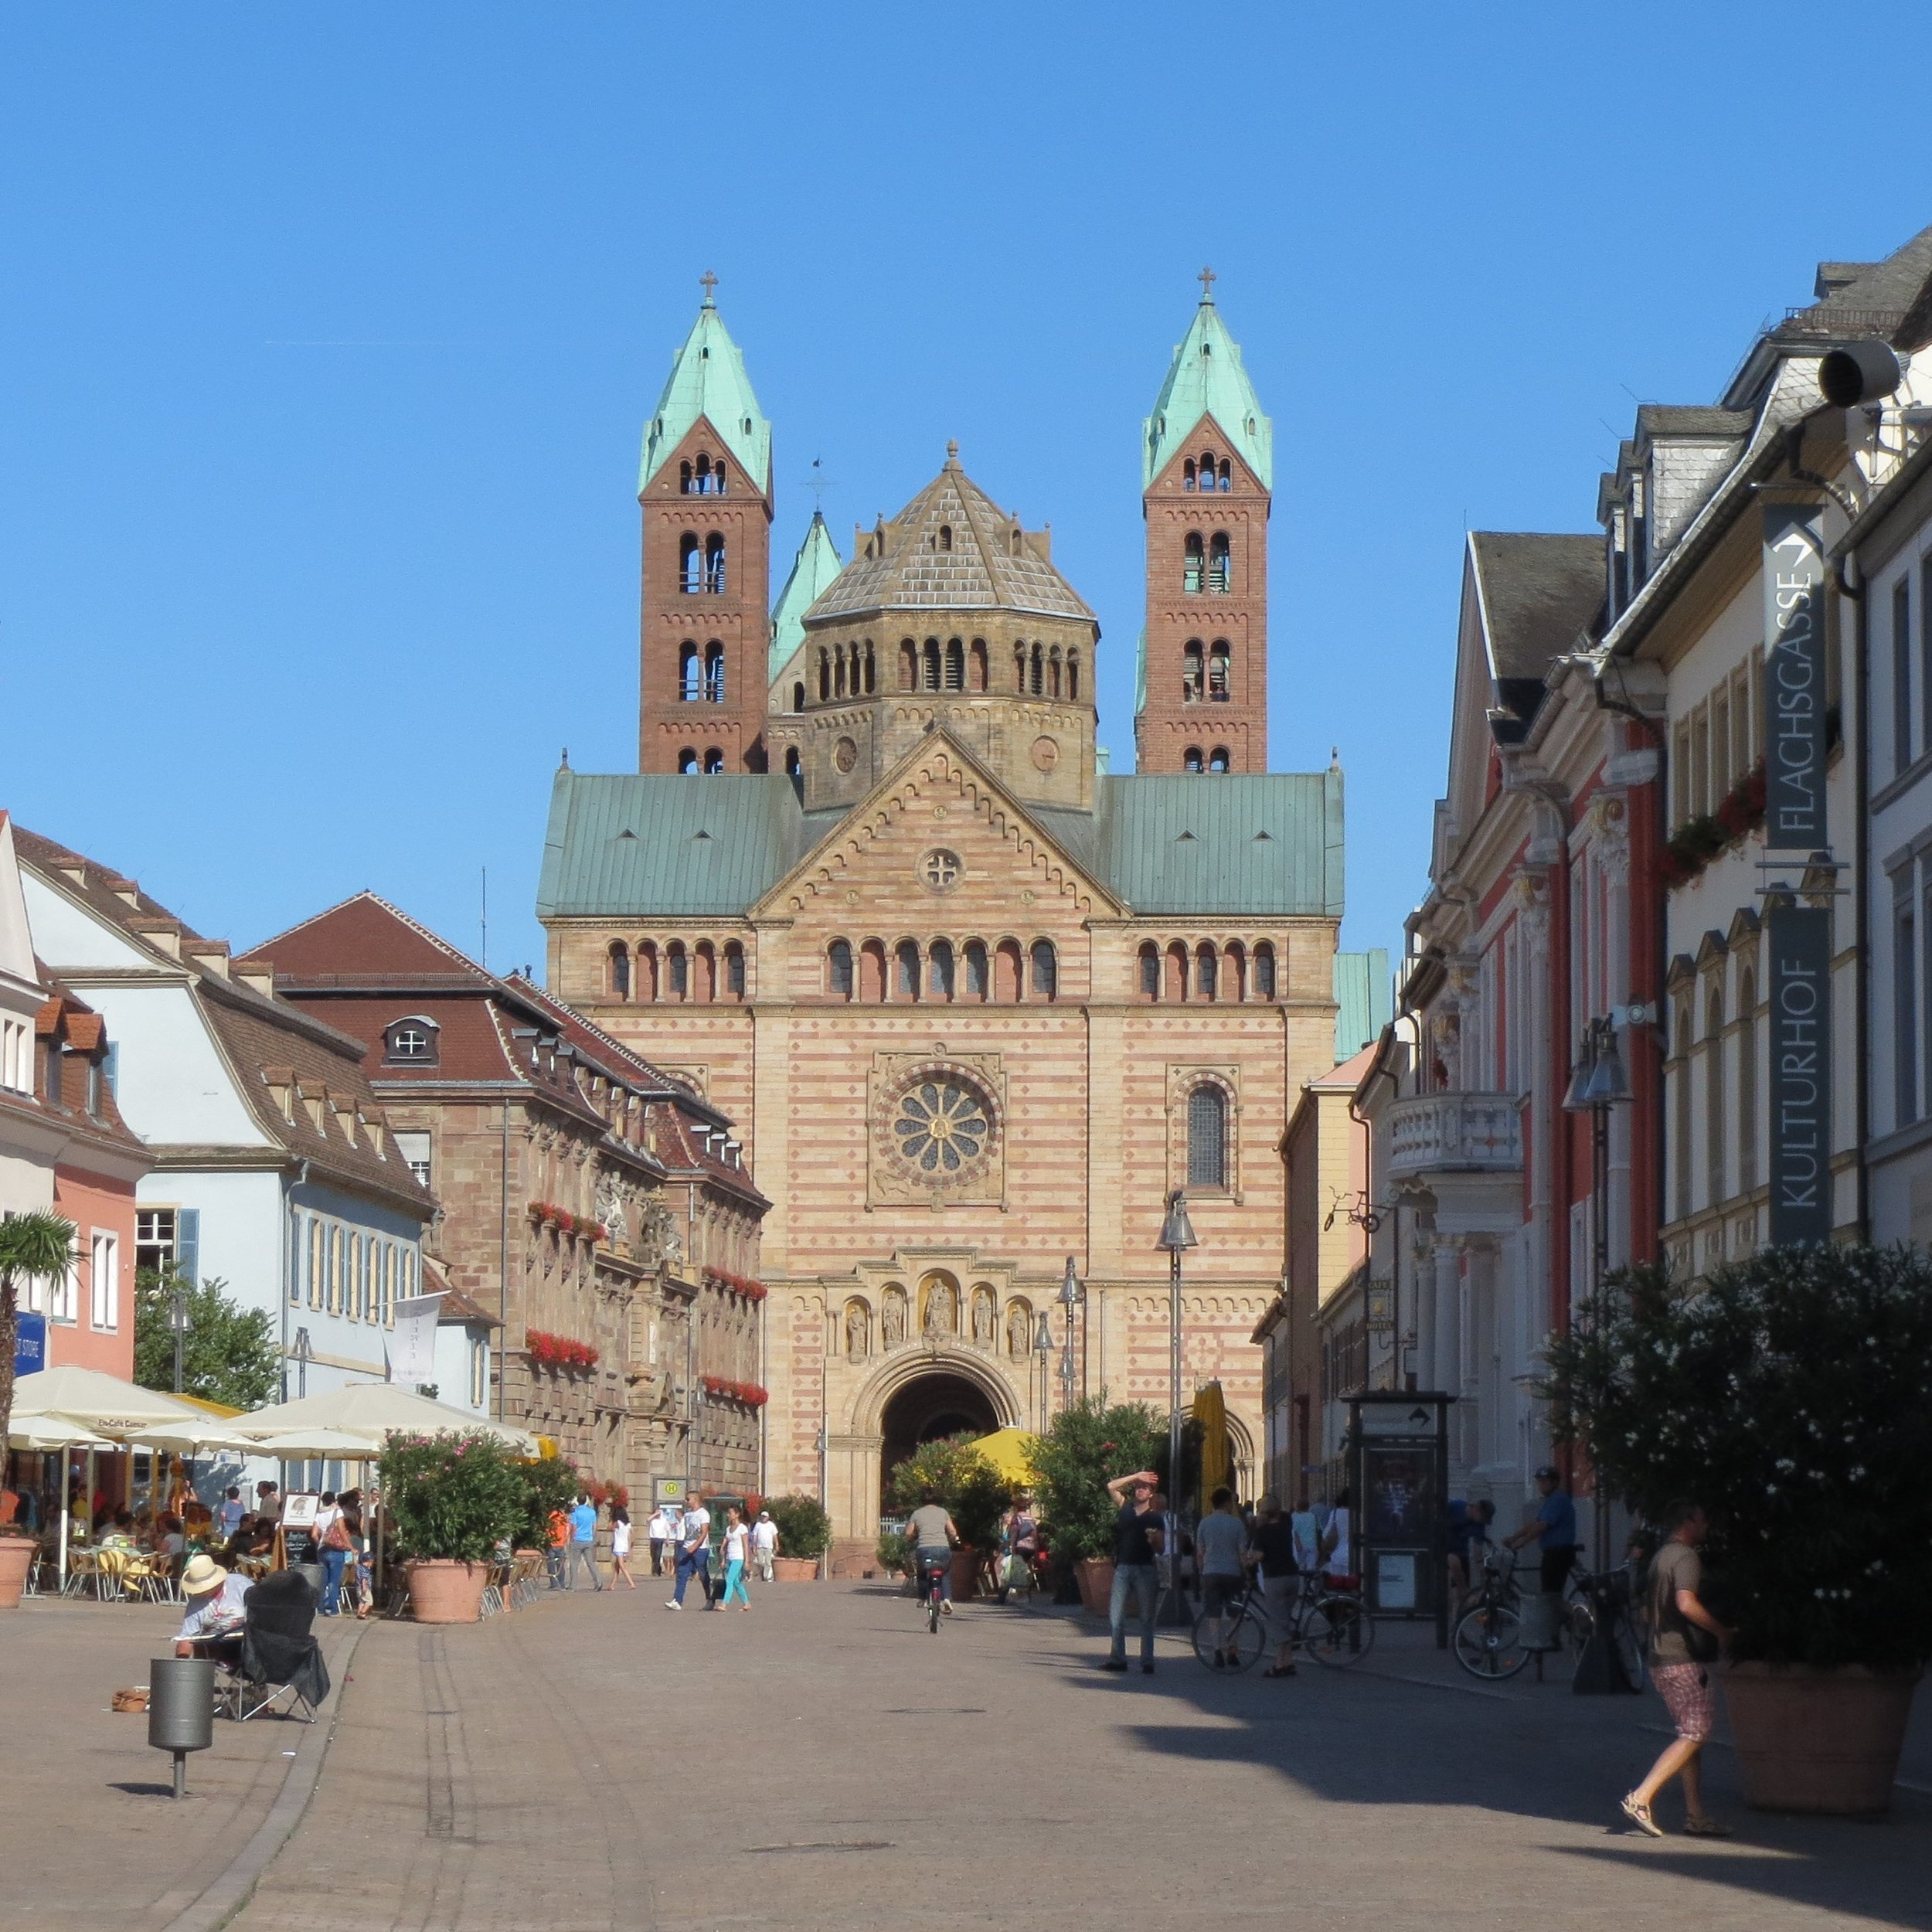 Universität Speyer, Germany